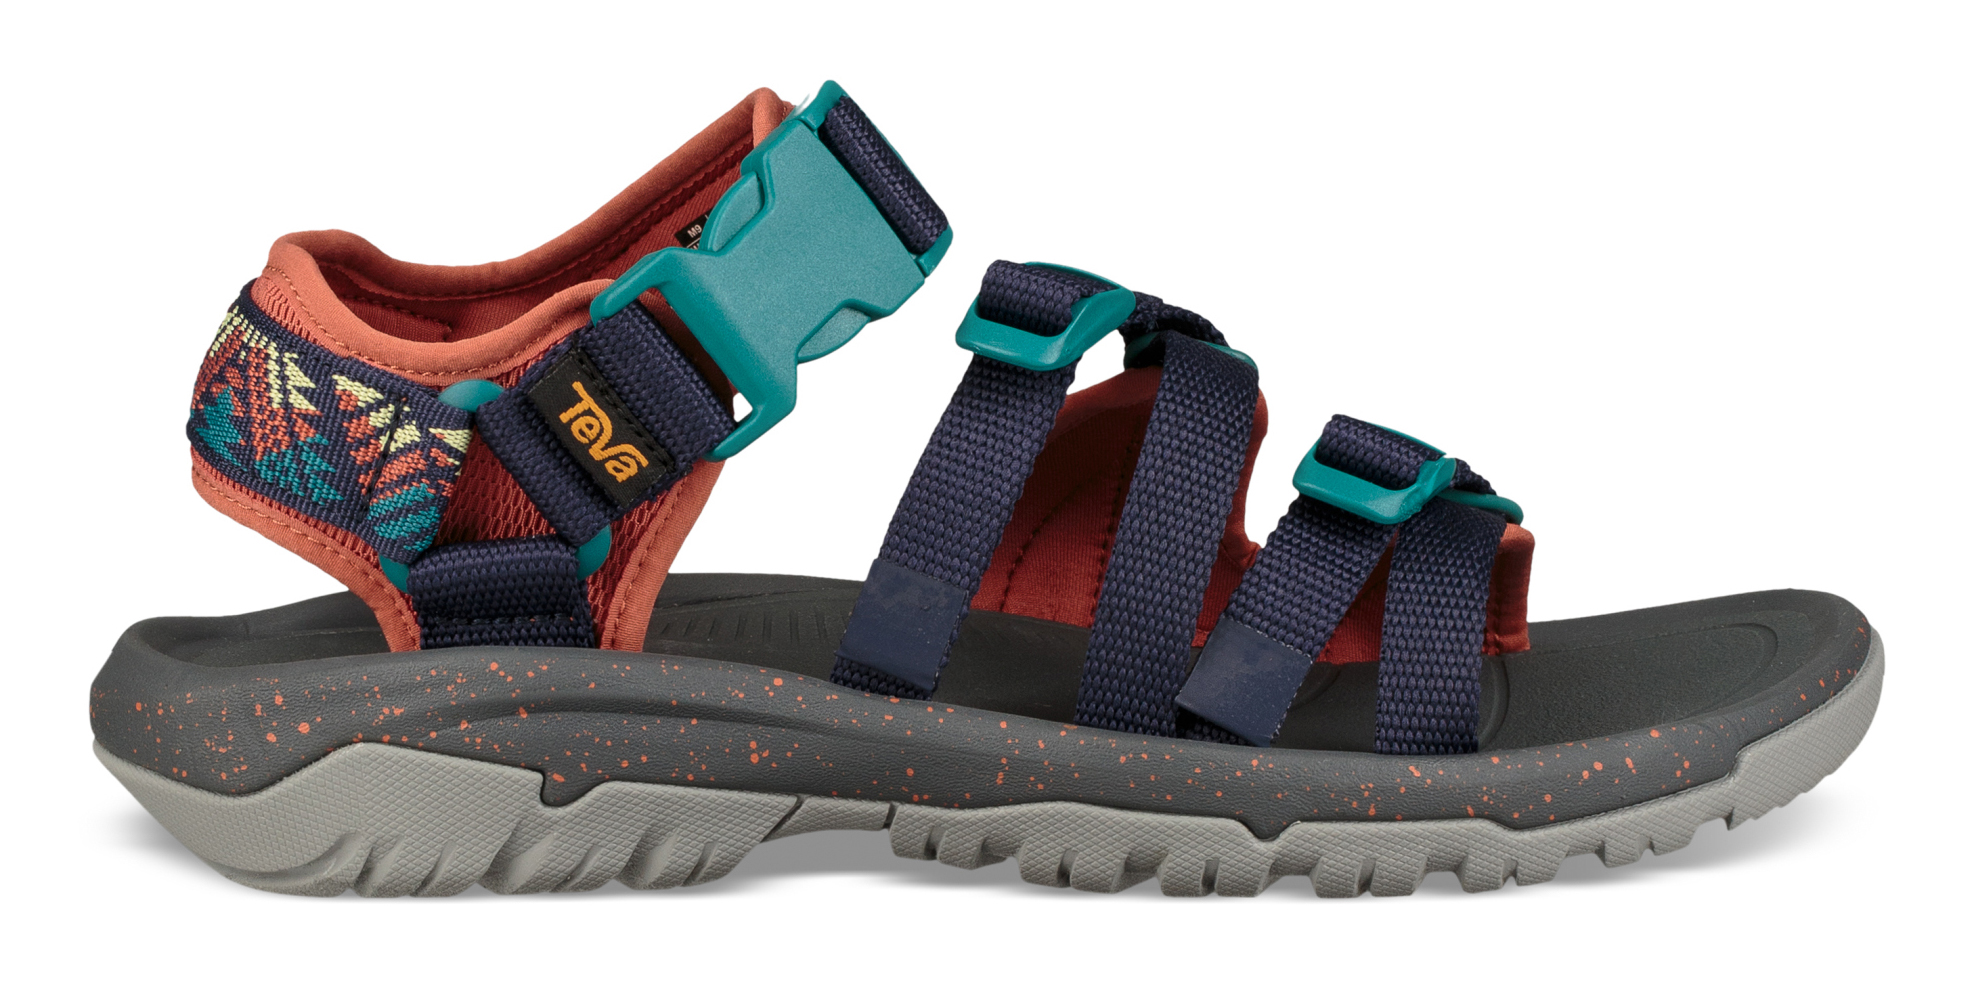 177723a94 Teva Hurricane XLT2 ALP Sandals - Mens with Free S H — CampSaver